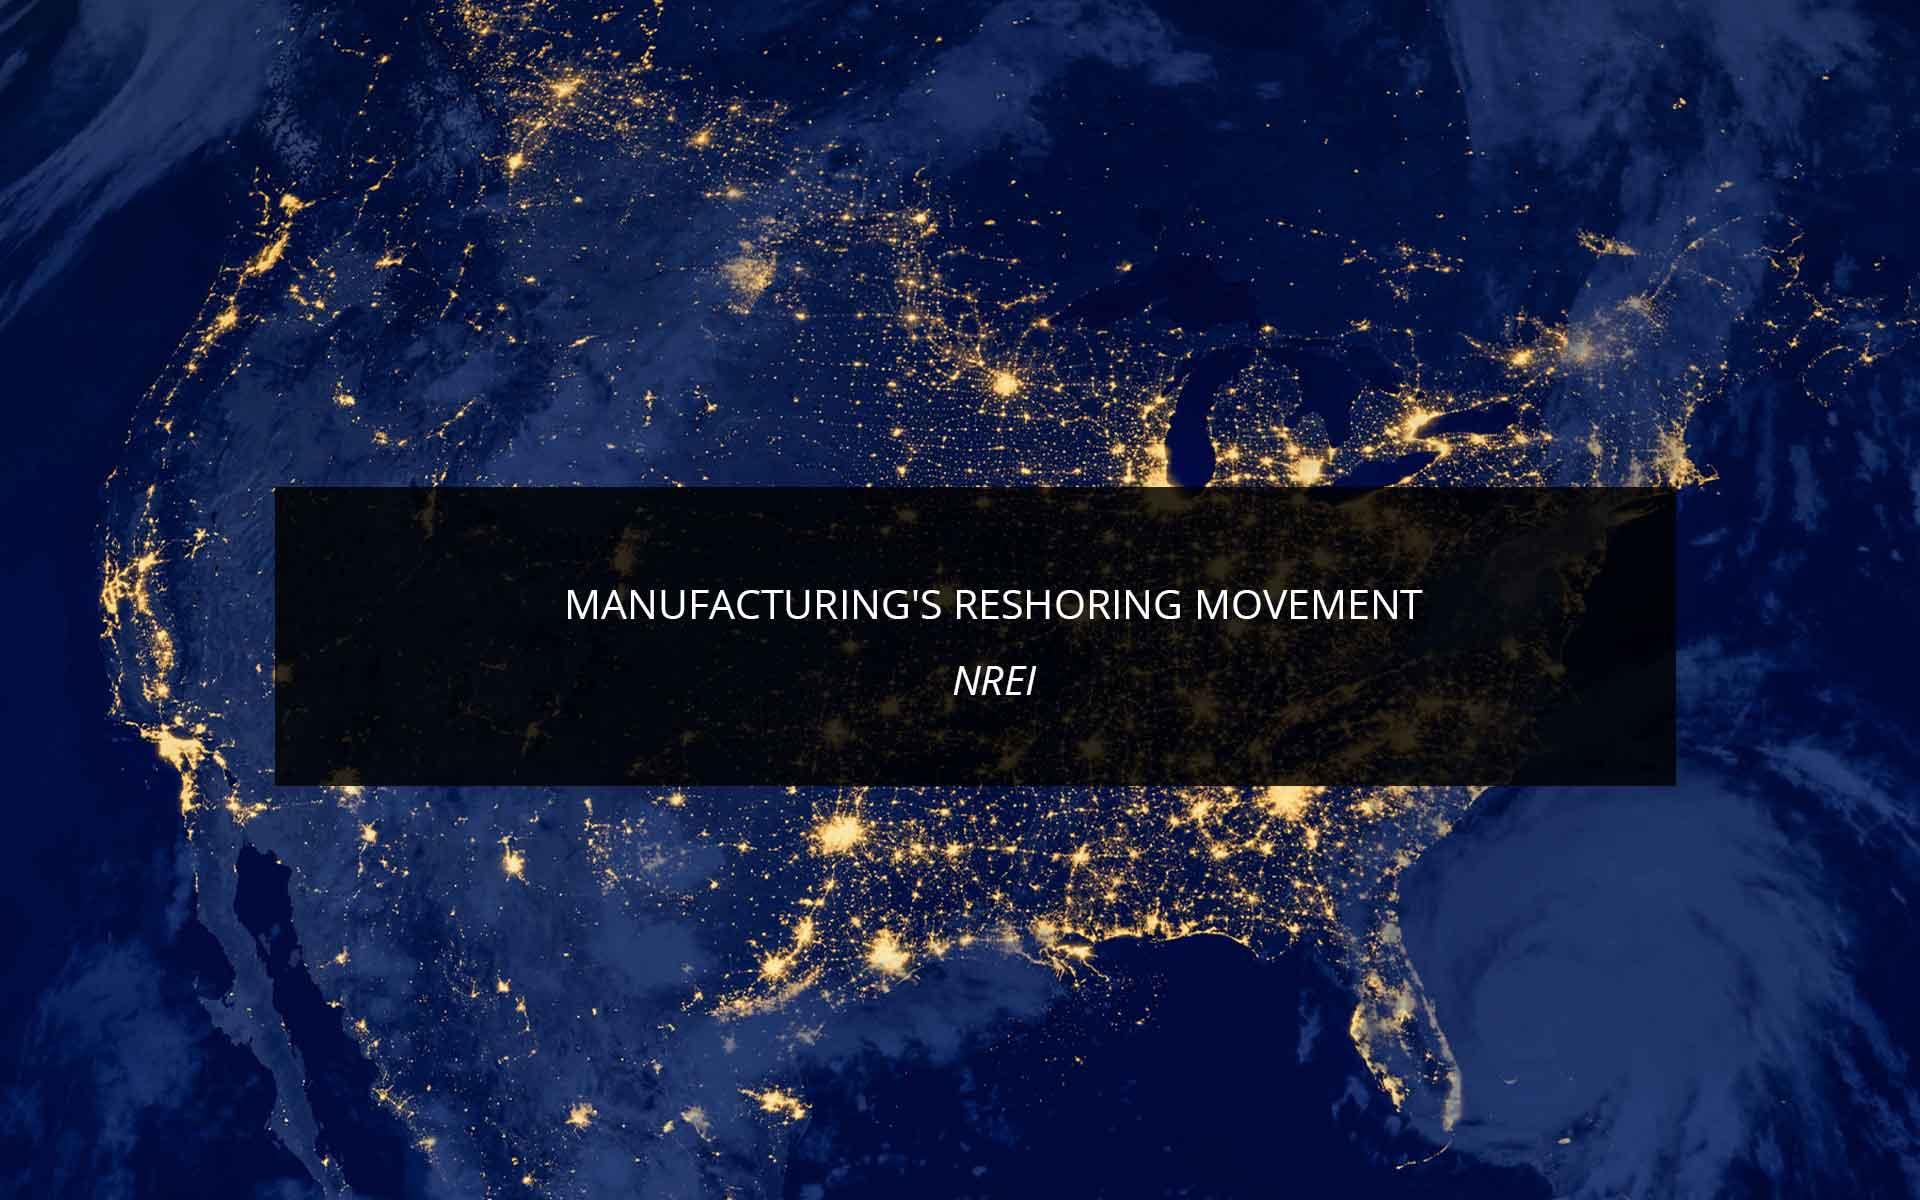 Manufacturing's Reshoring Movement